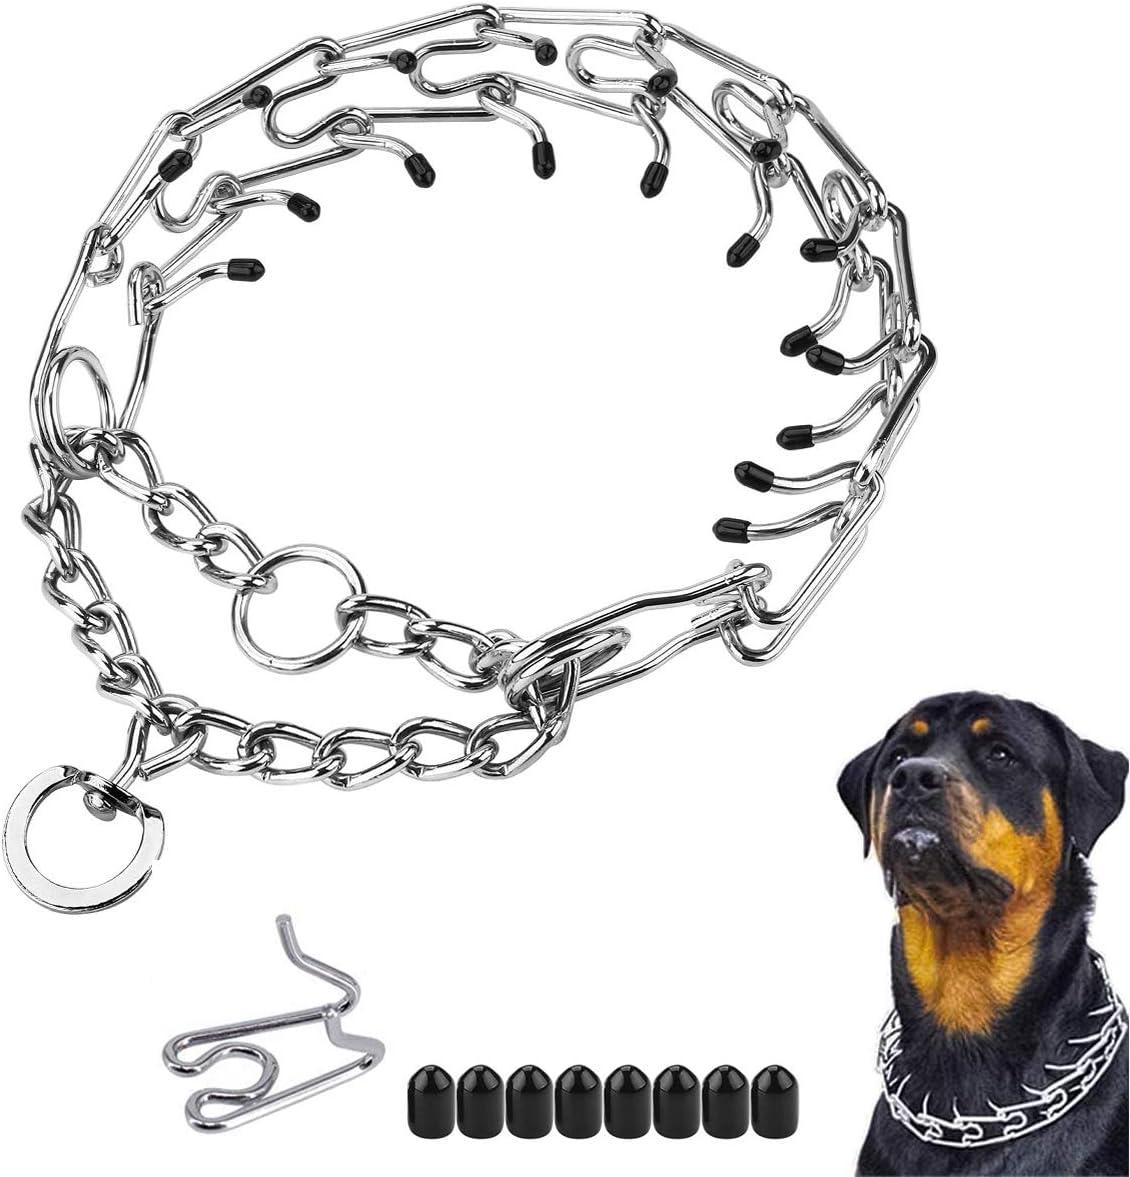 Prong Collar Direct stock discount Tulsa Mall for Dogs Dog Training Choke Adjustabl Pinch